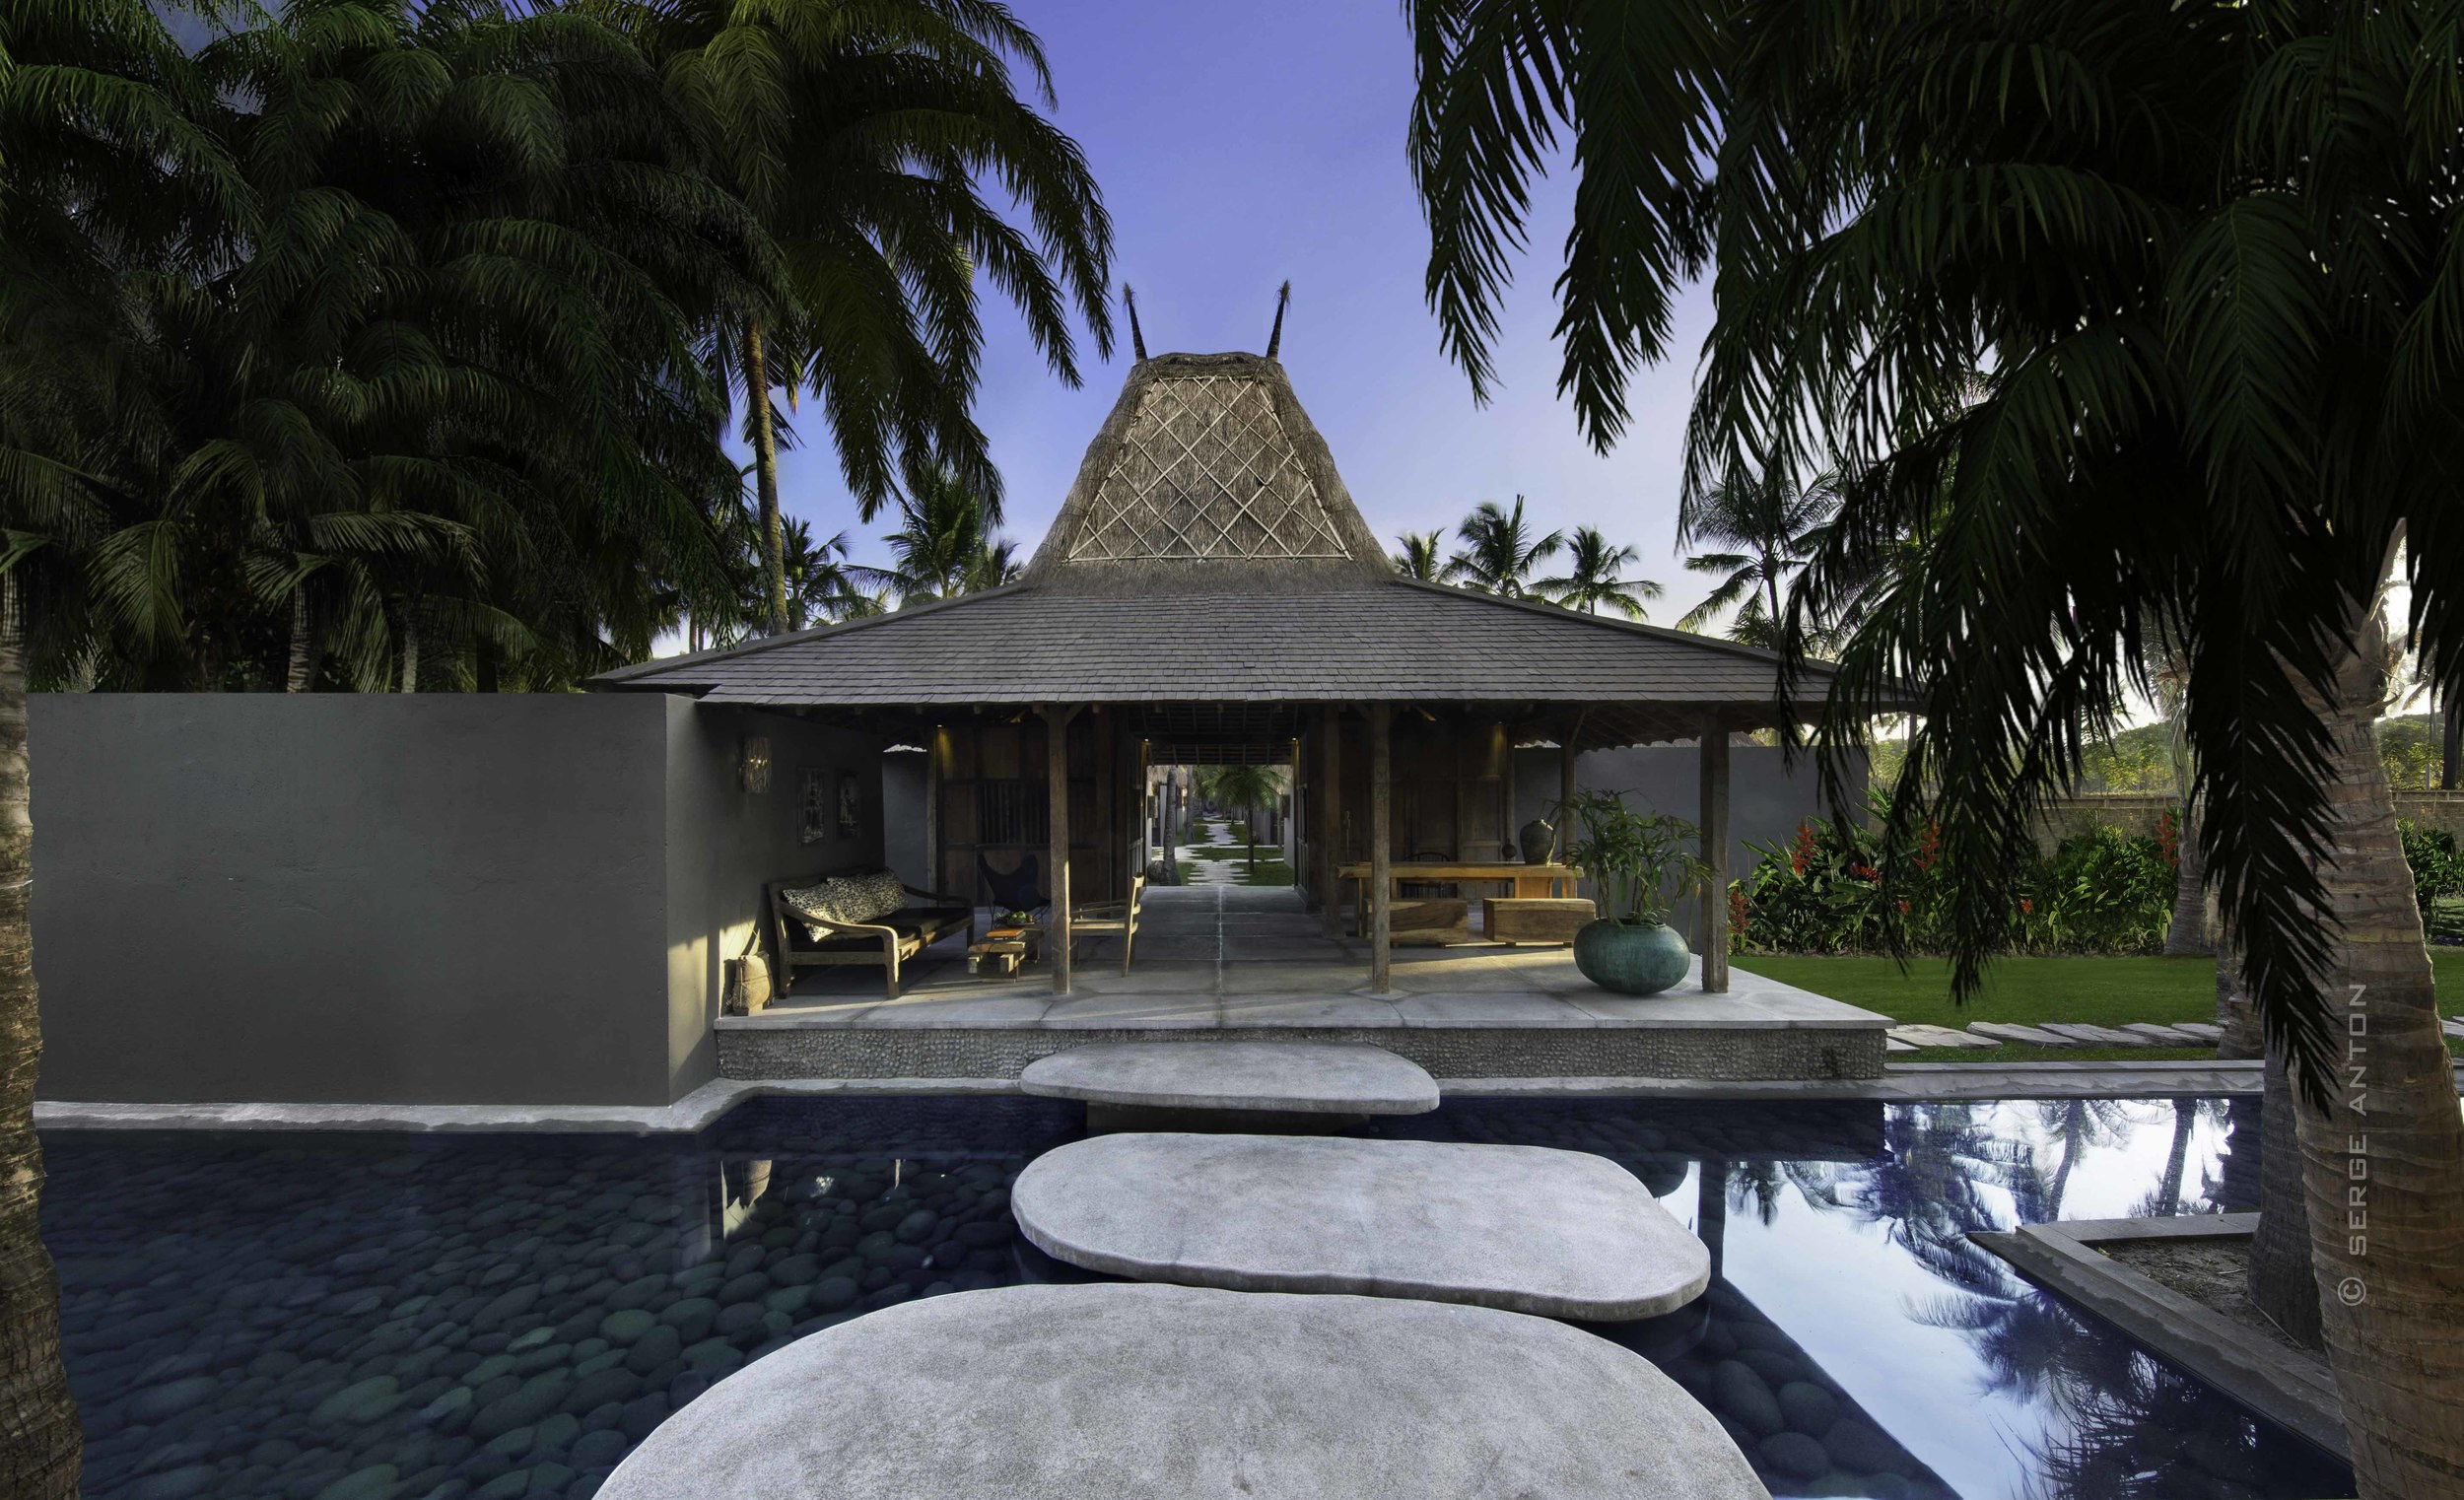 du lịch Bali-Slow-travel-elldecoration vn4